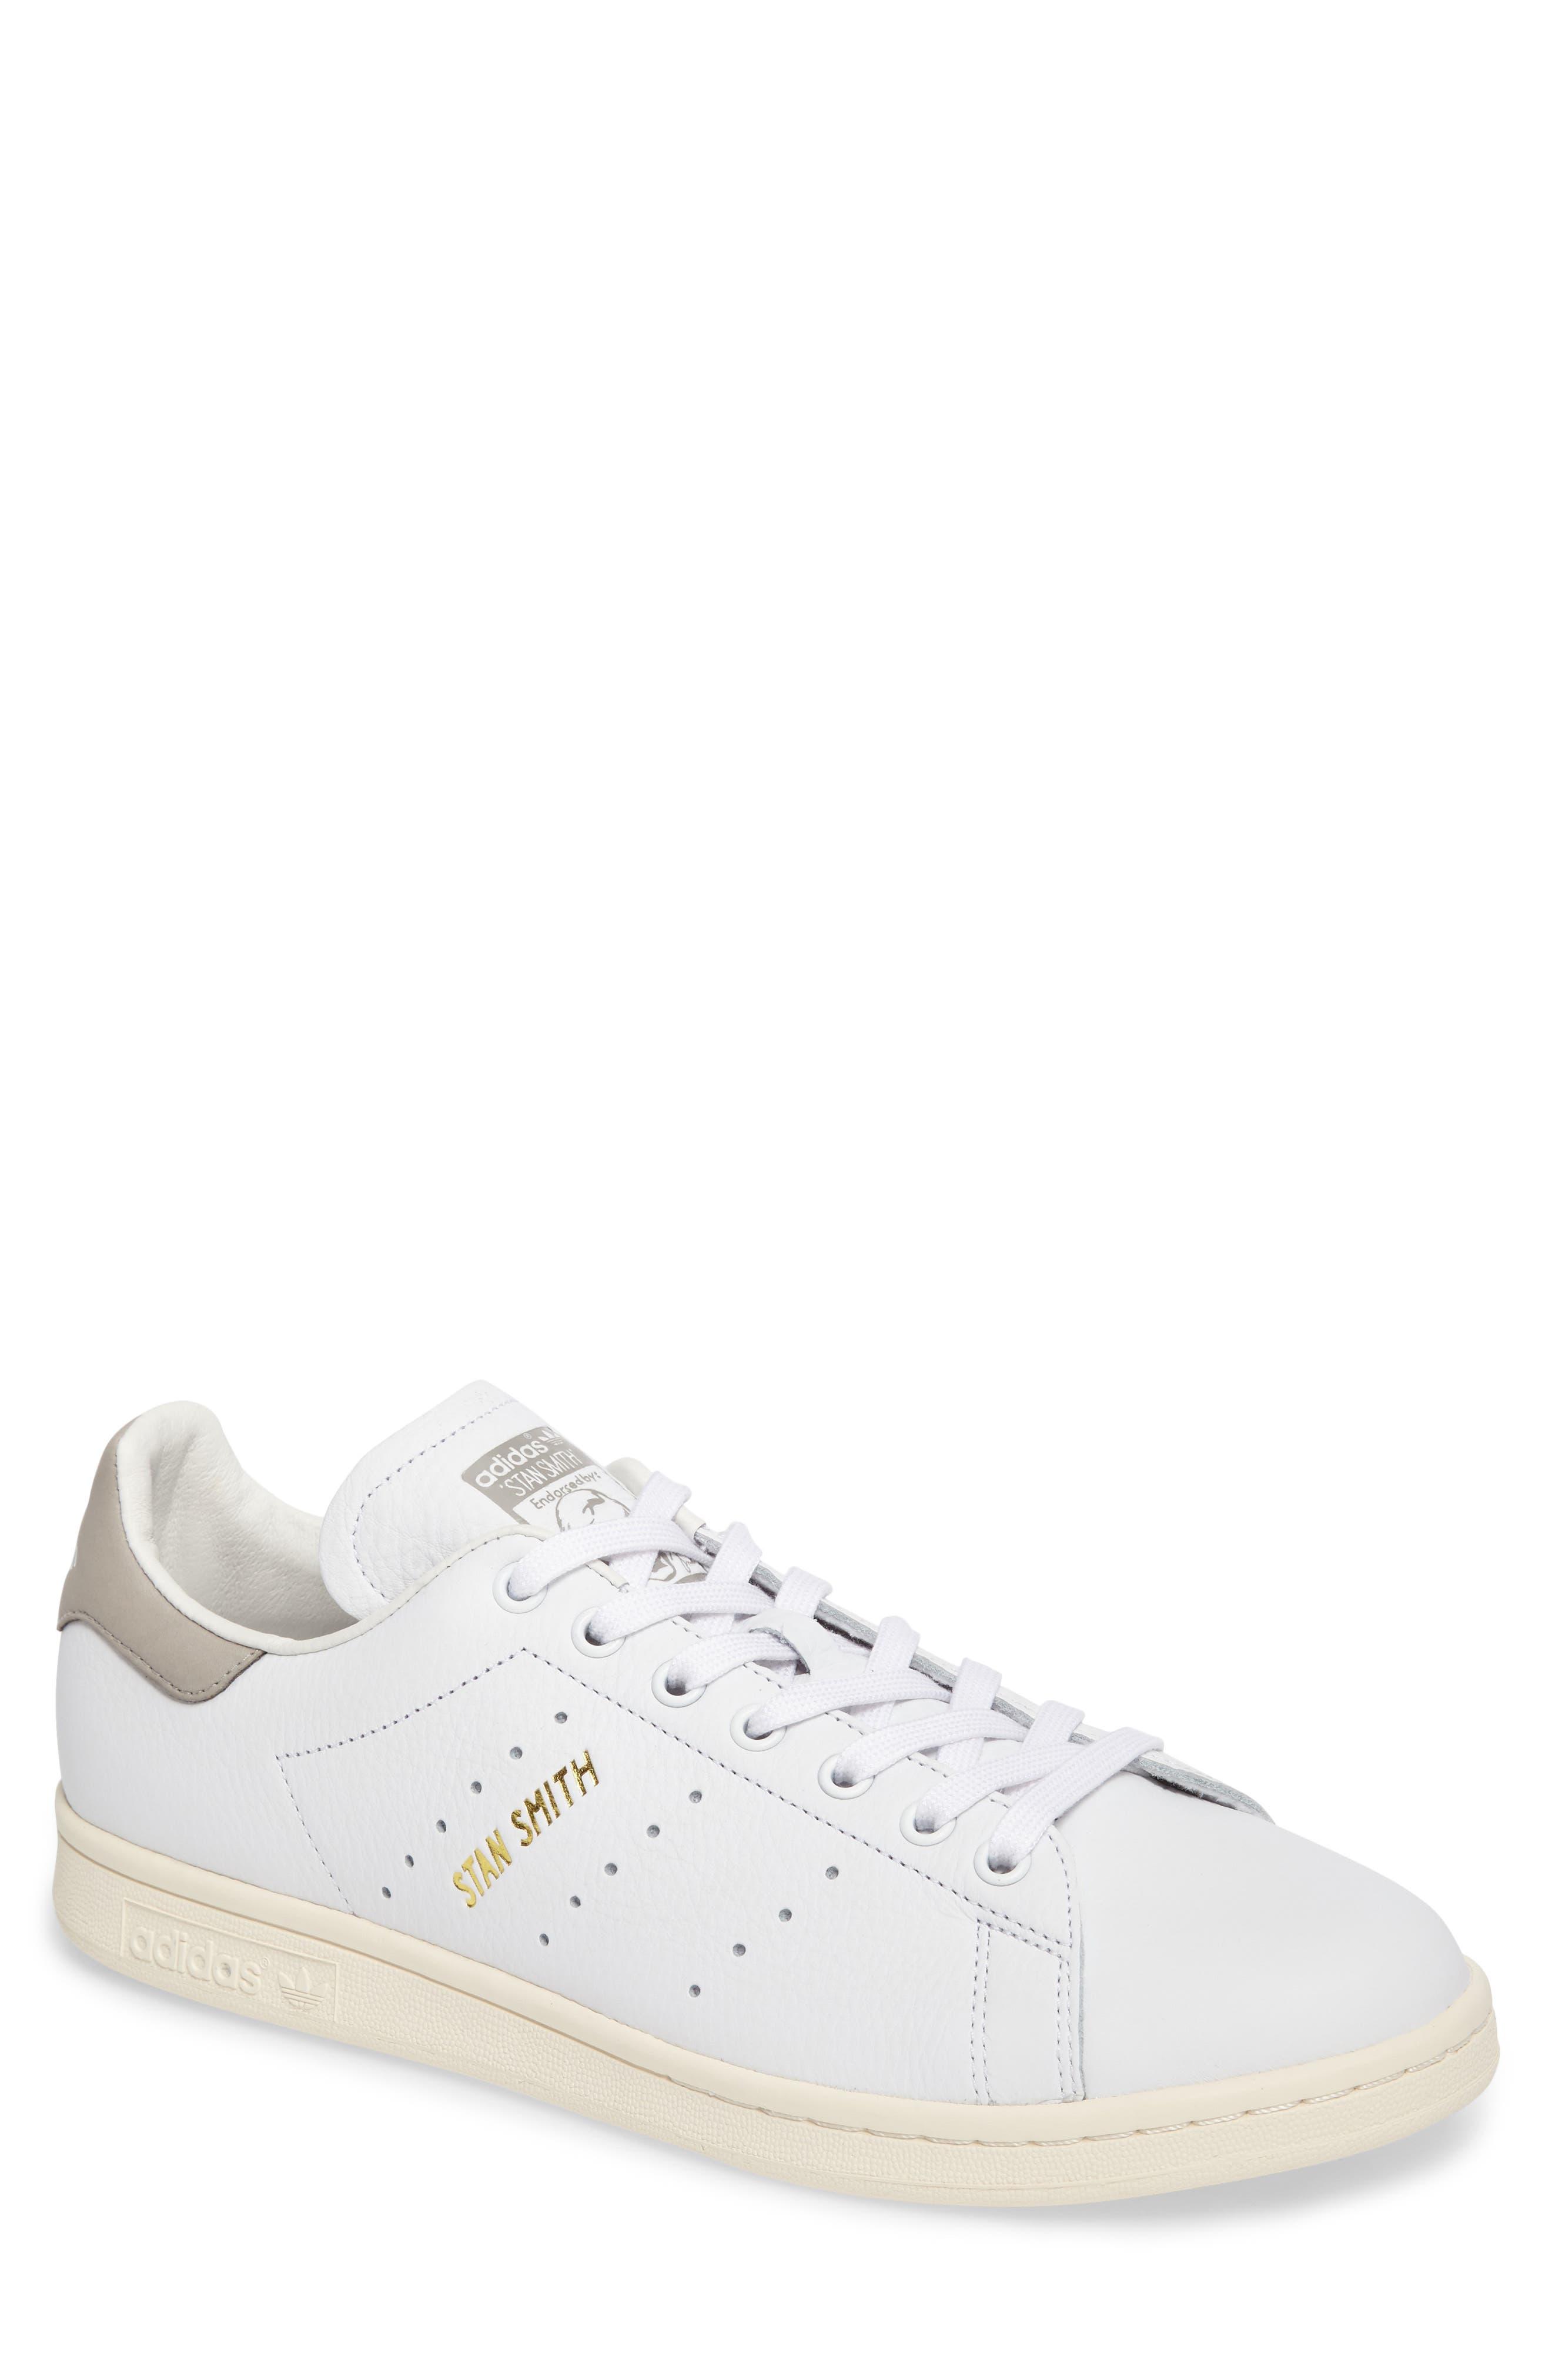 Stan Smith Sneaker,                         Main,                         color, 100